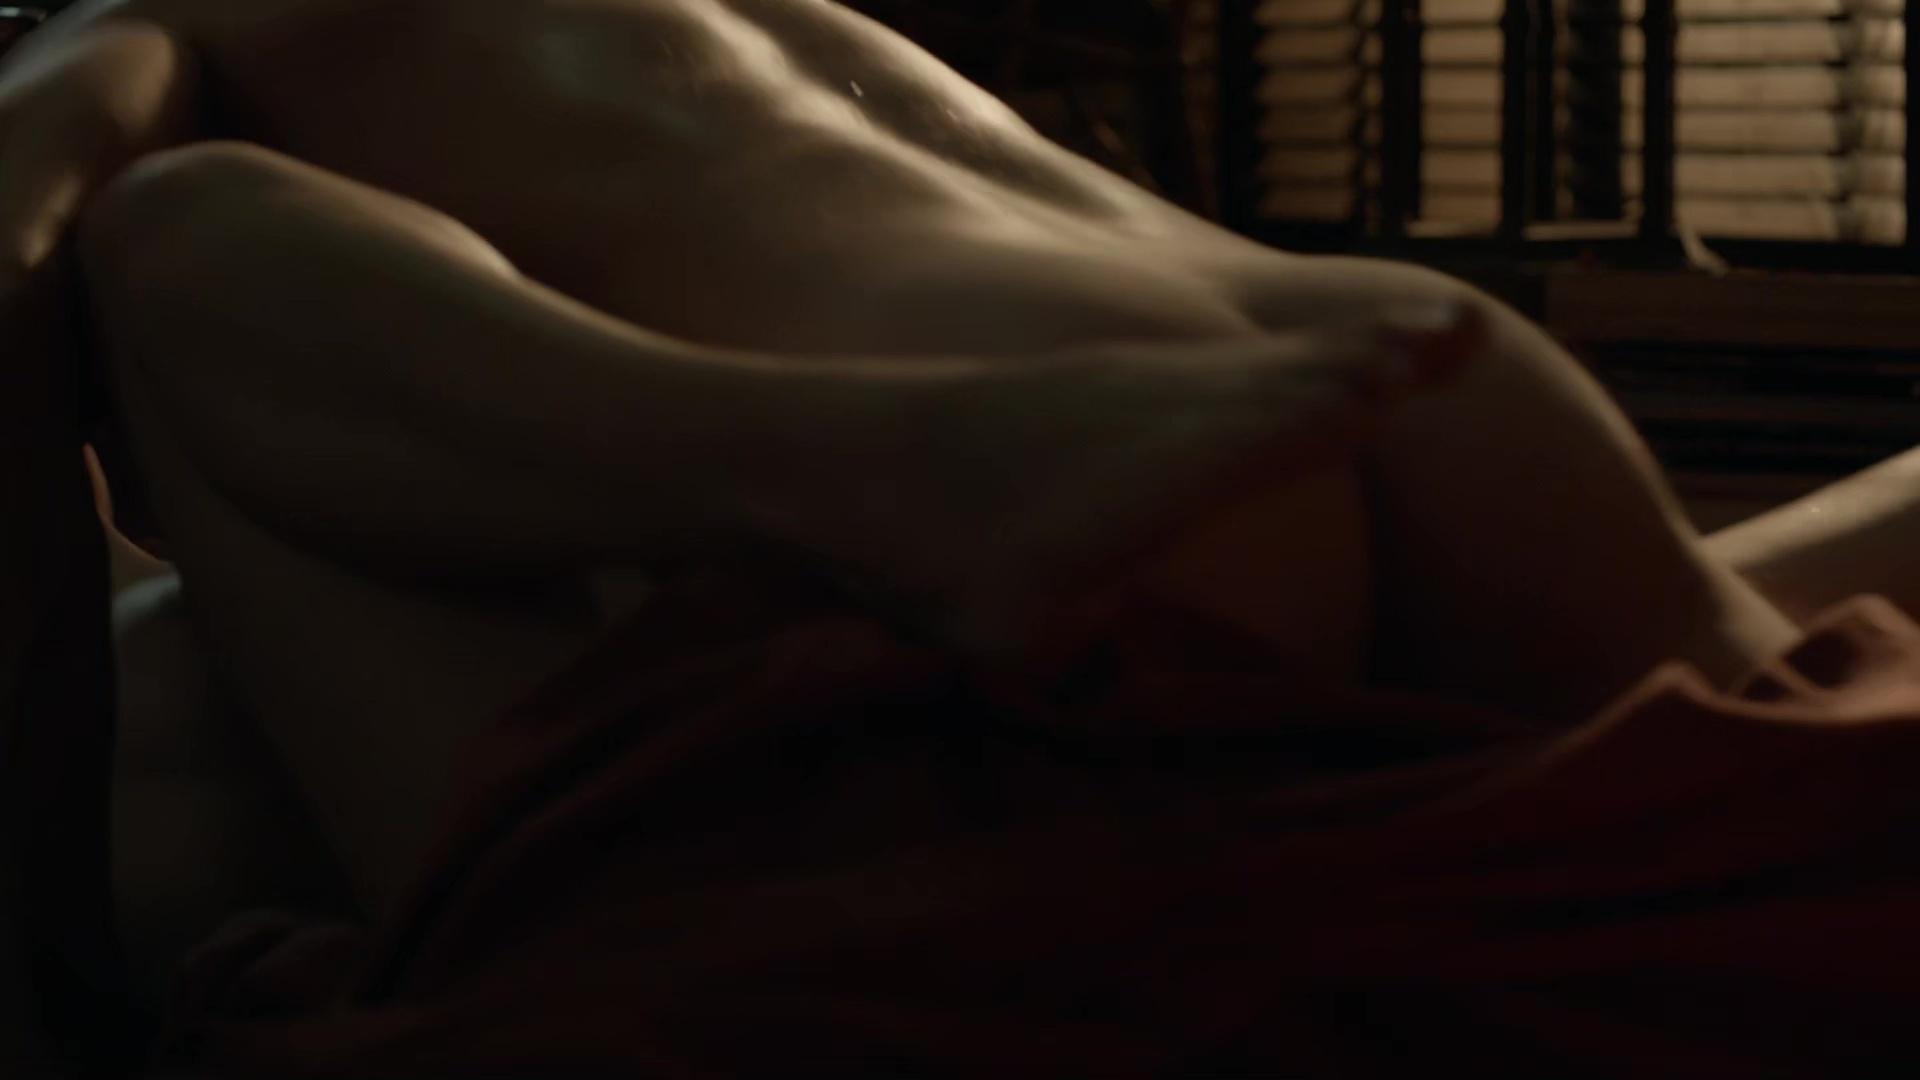 Katie wall nude aznude